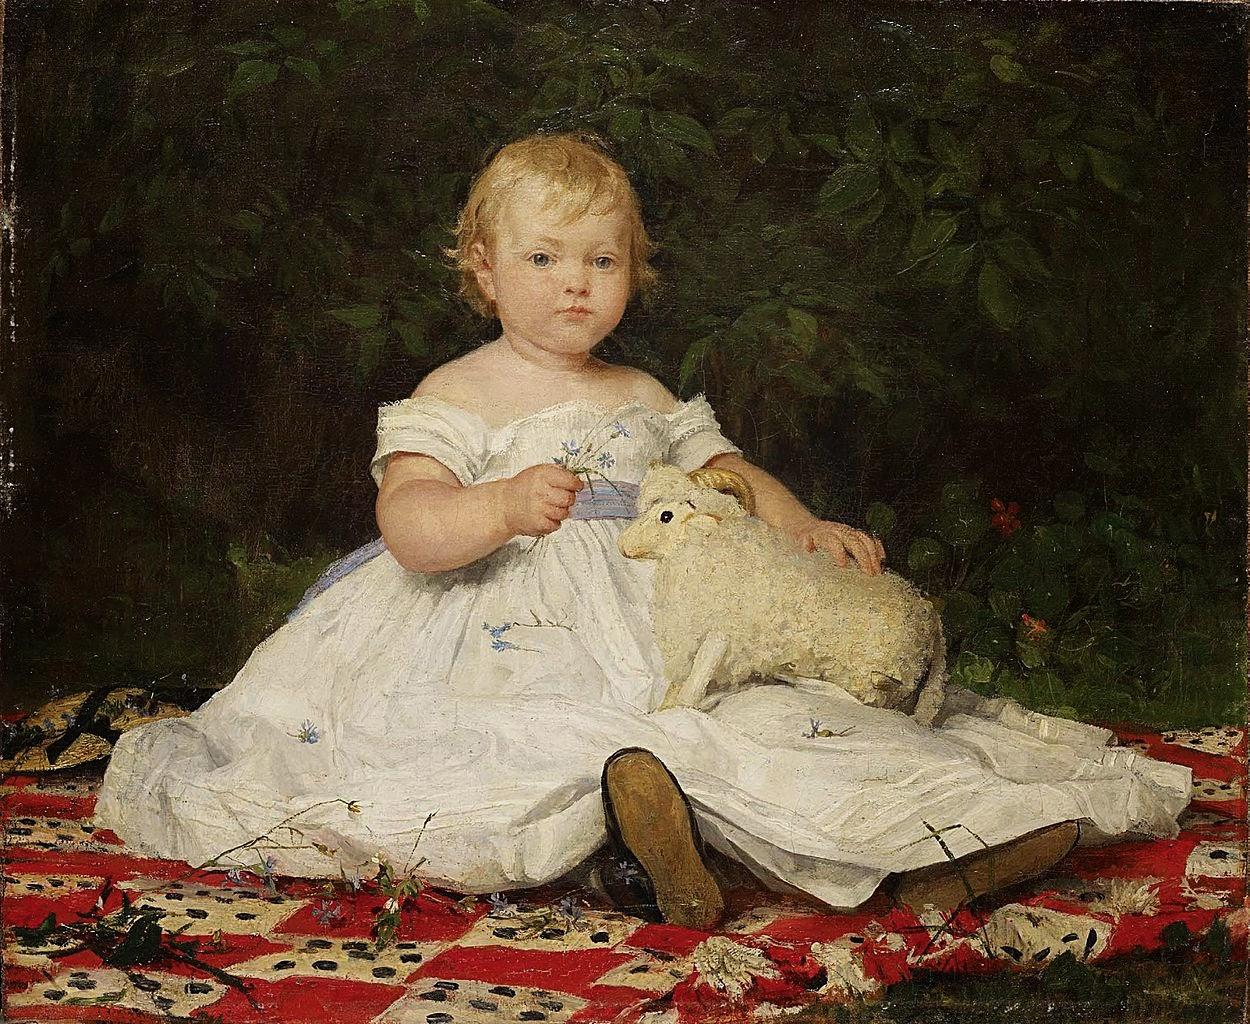 albert anker, painting review,cute paintings